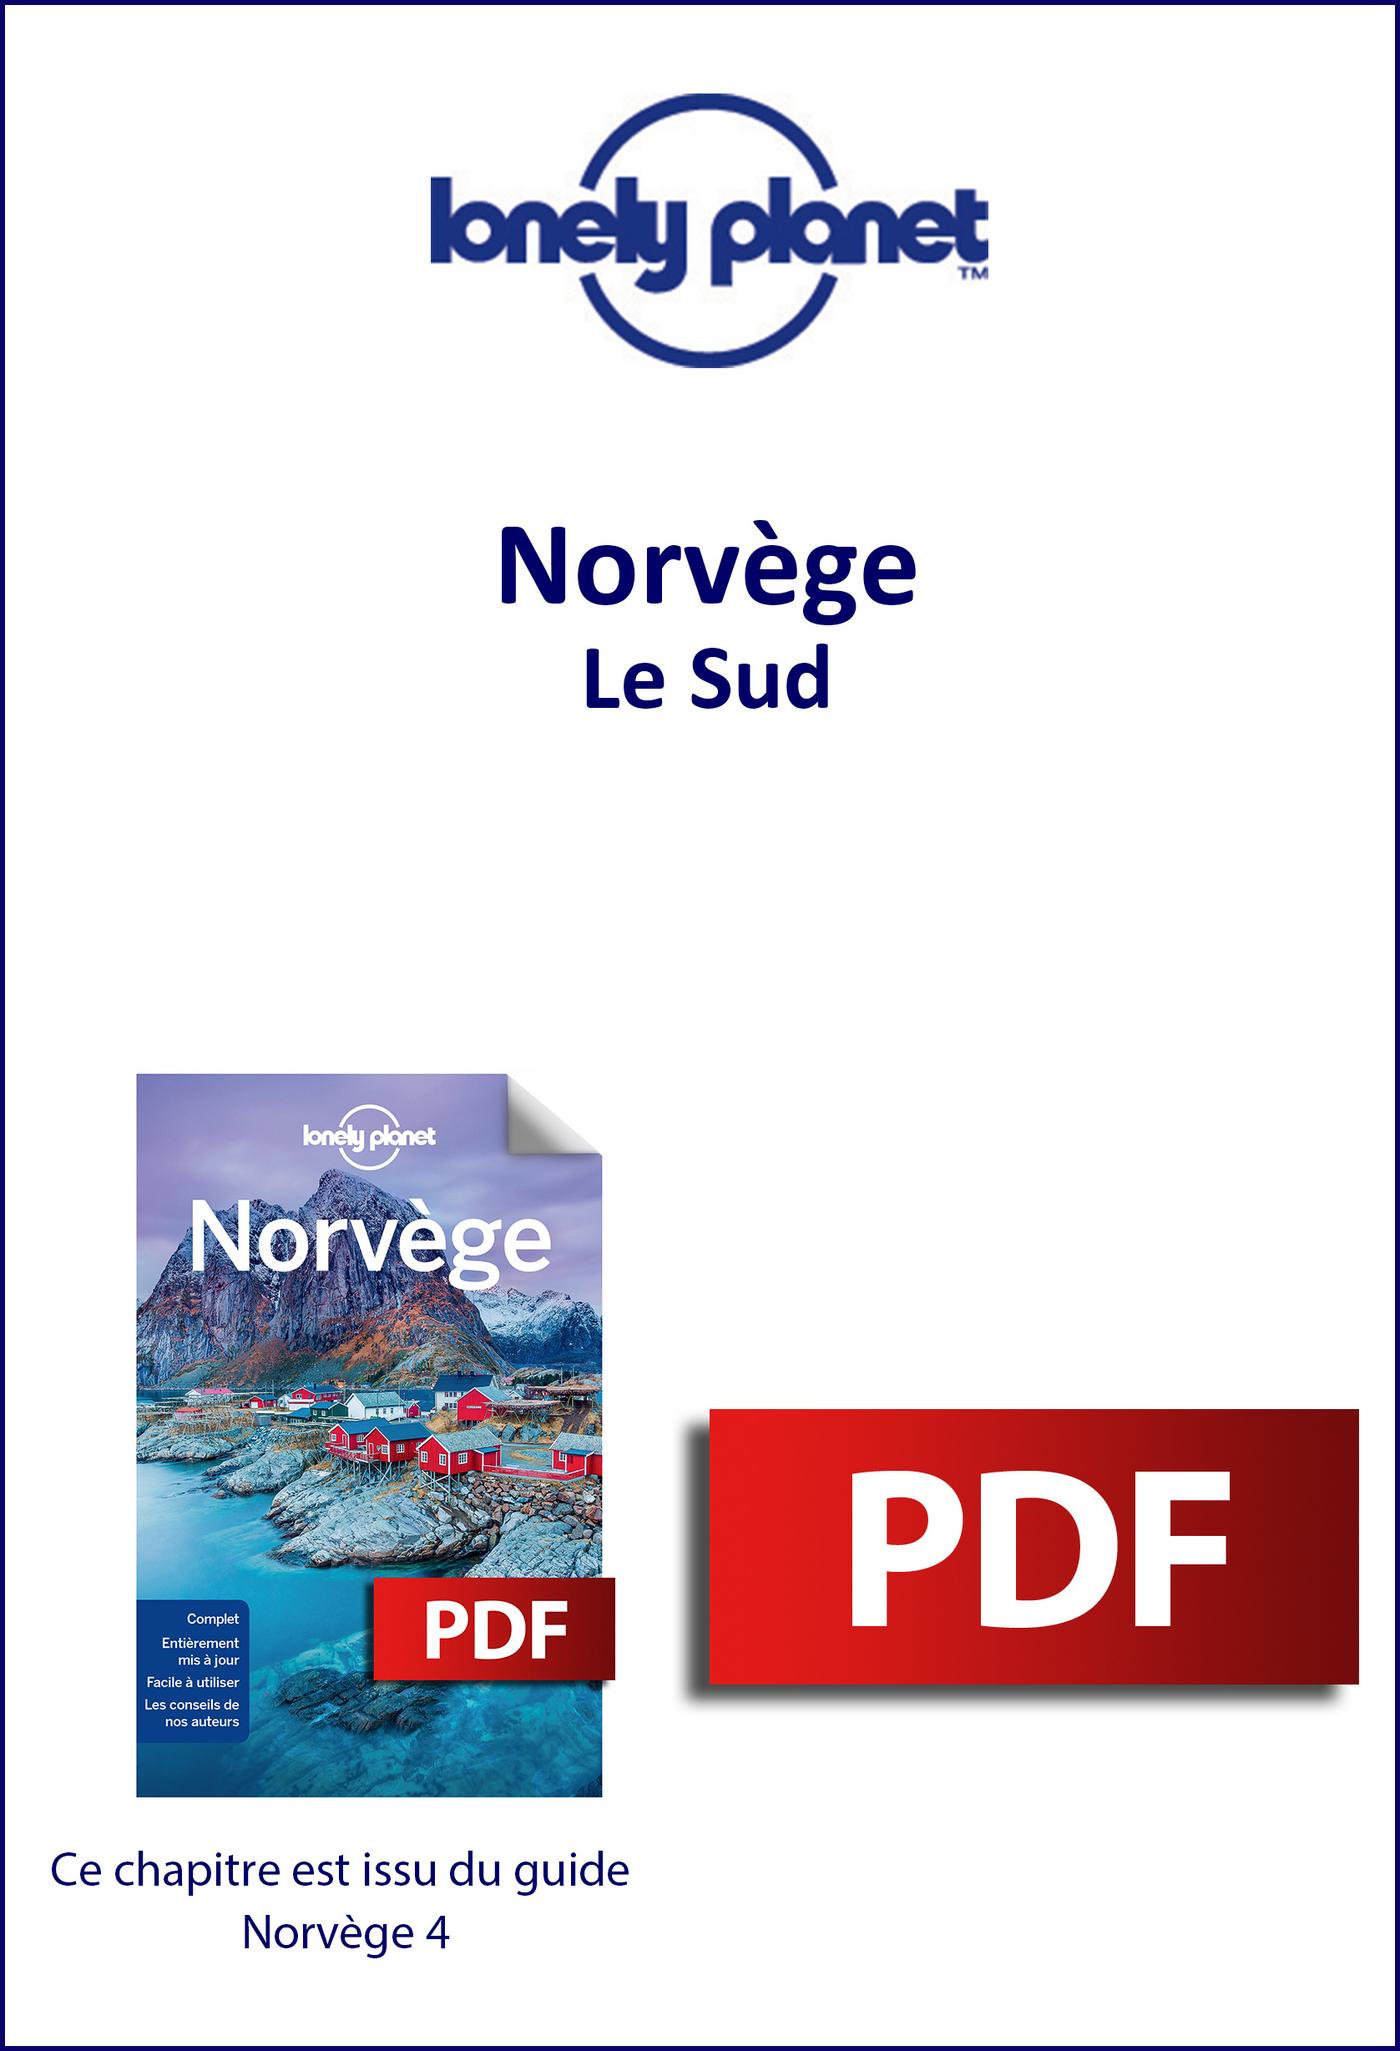 Norvège - Le Sud